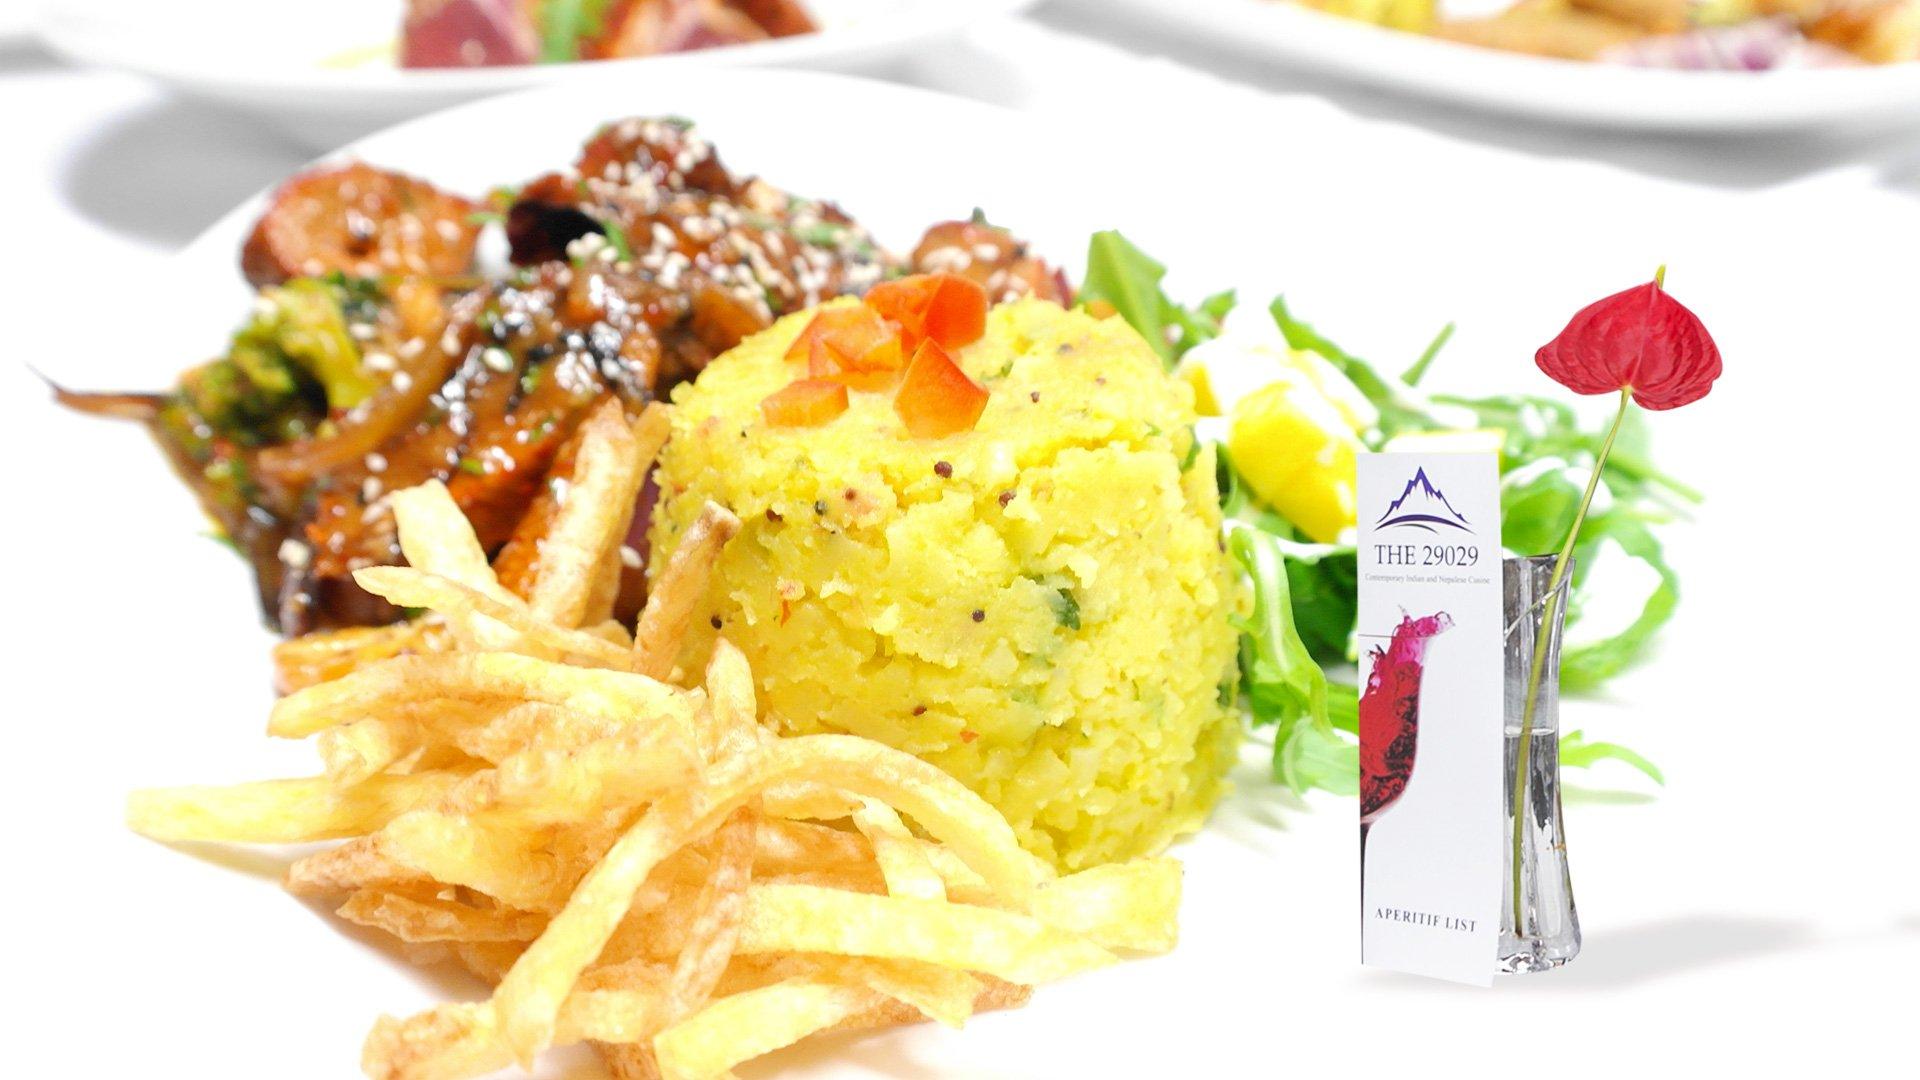 Food Banner - 29029 Restaurant - Best Traditional Indian Restaurant Broadstone